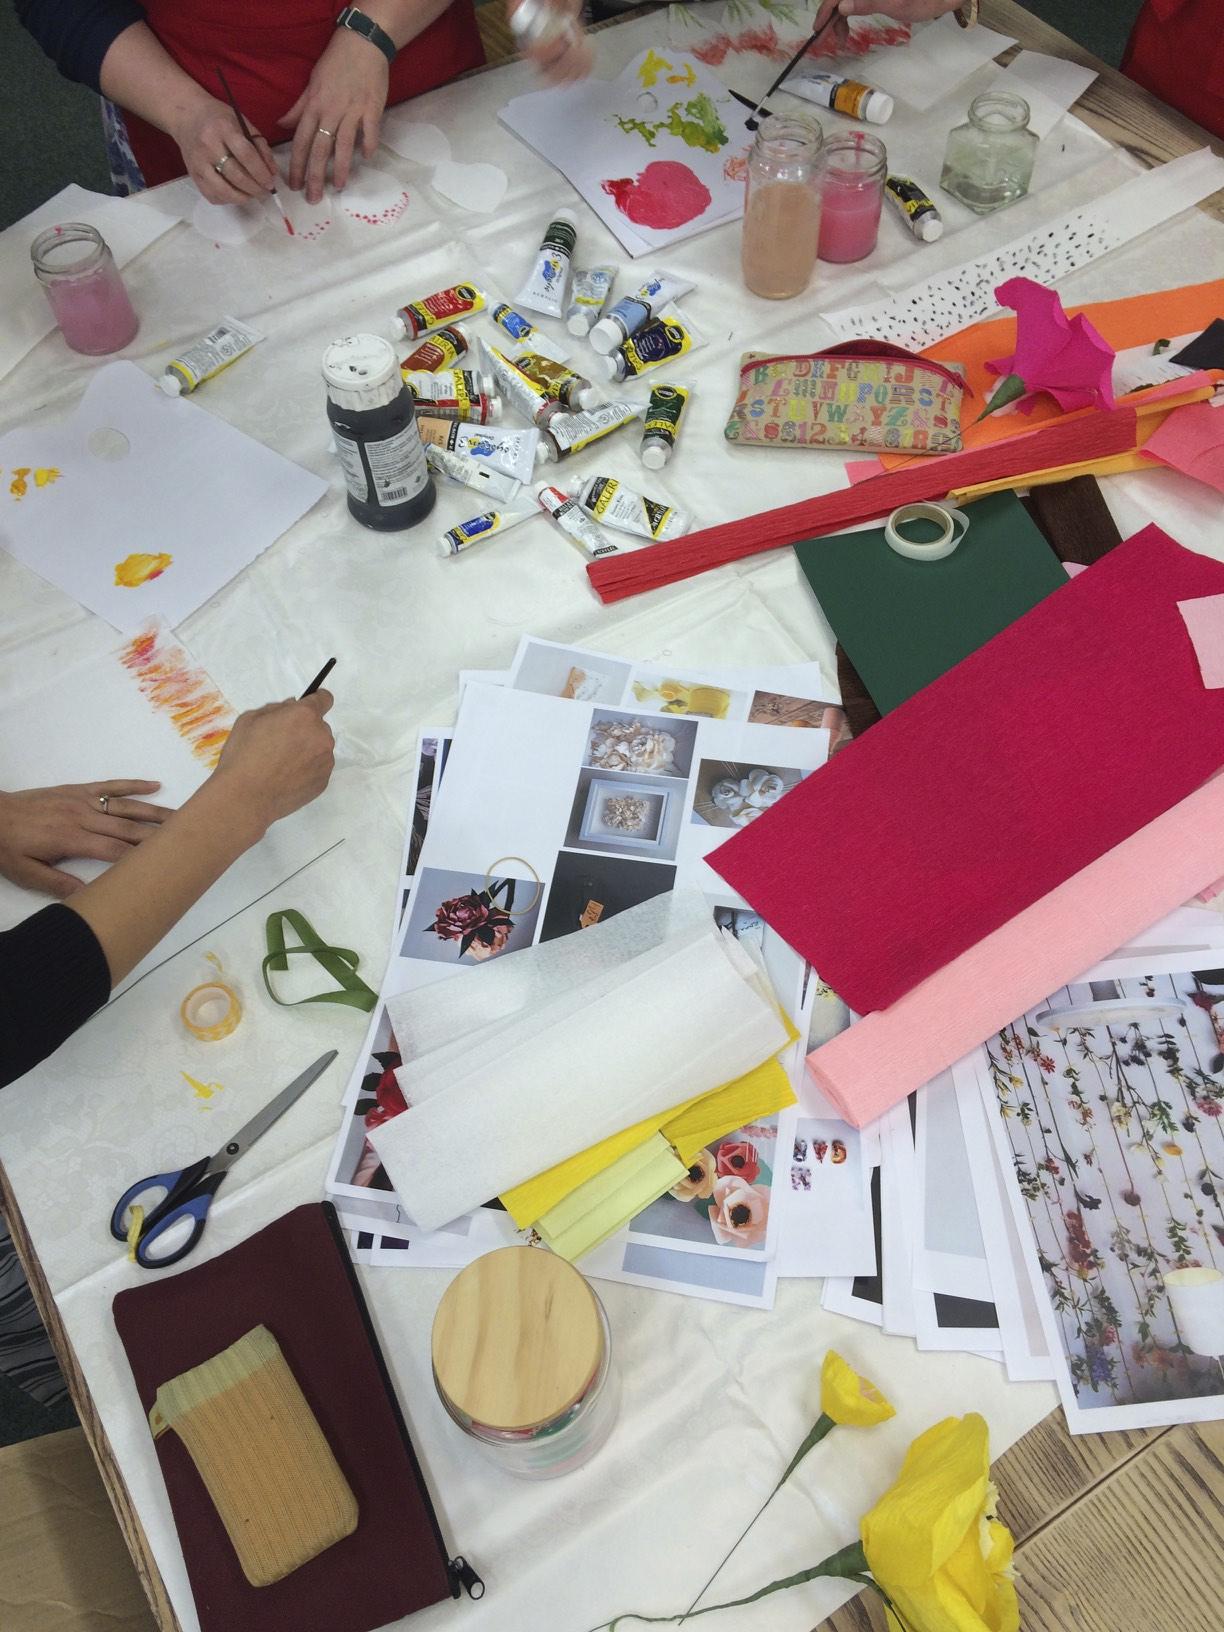 1Inspiring_Creative_Workshop_Design_Thinking.jpg